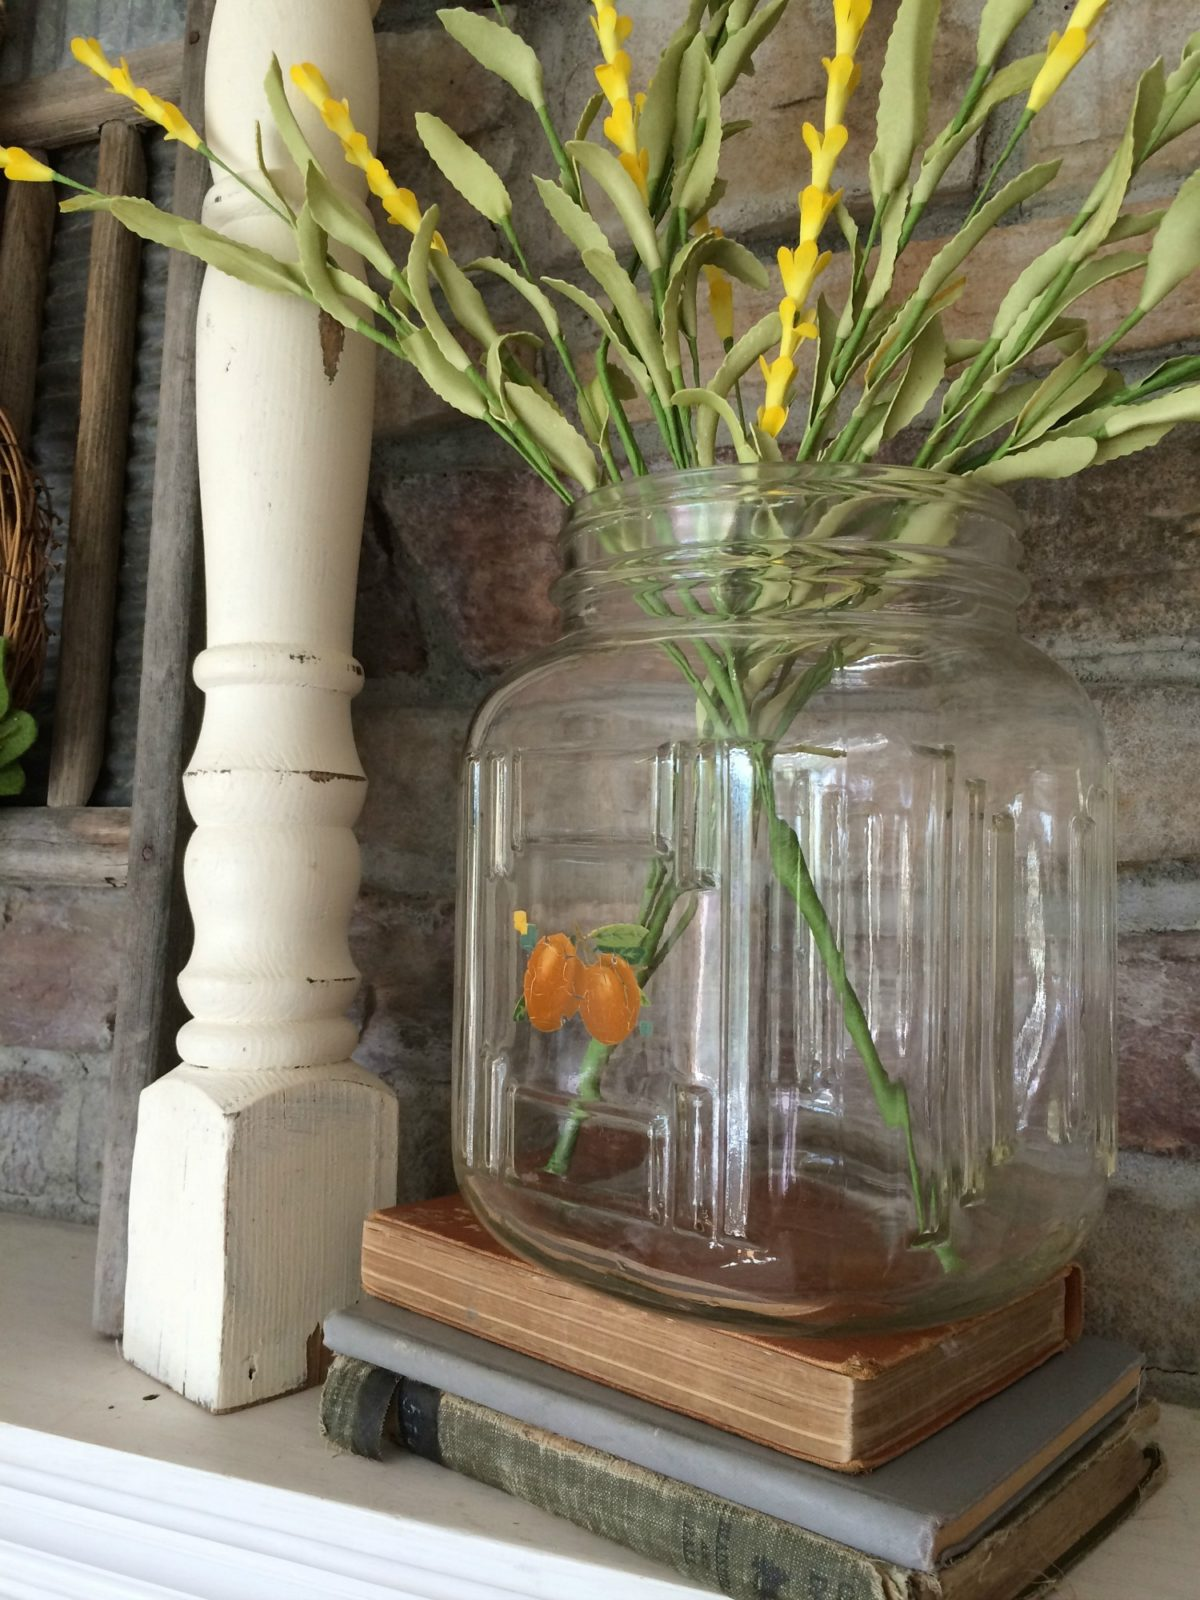 Simple Summertime Mantel & Vintage Jar